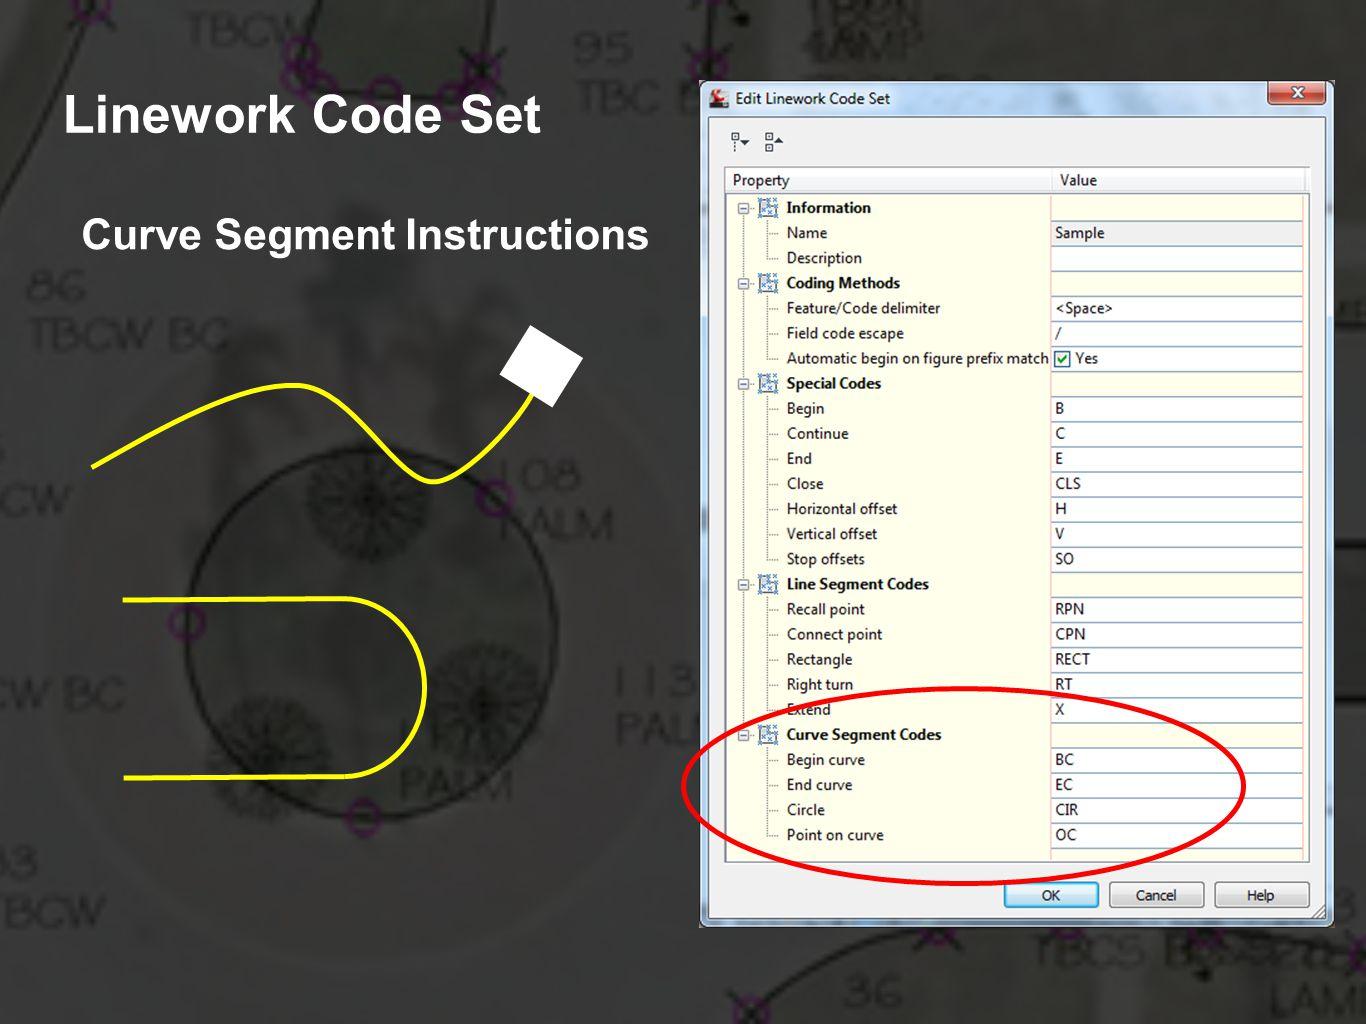 Linework Code Set Curve Segment Instructions